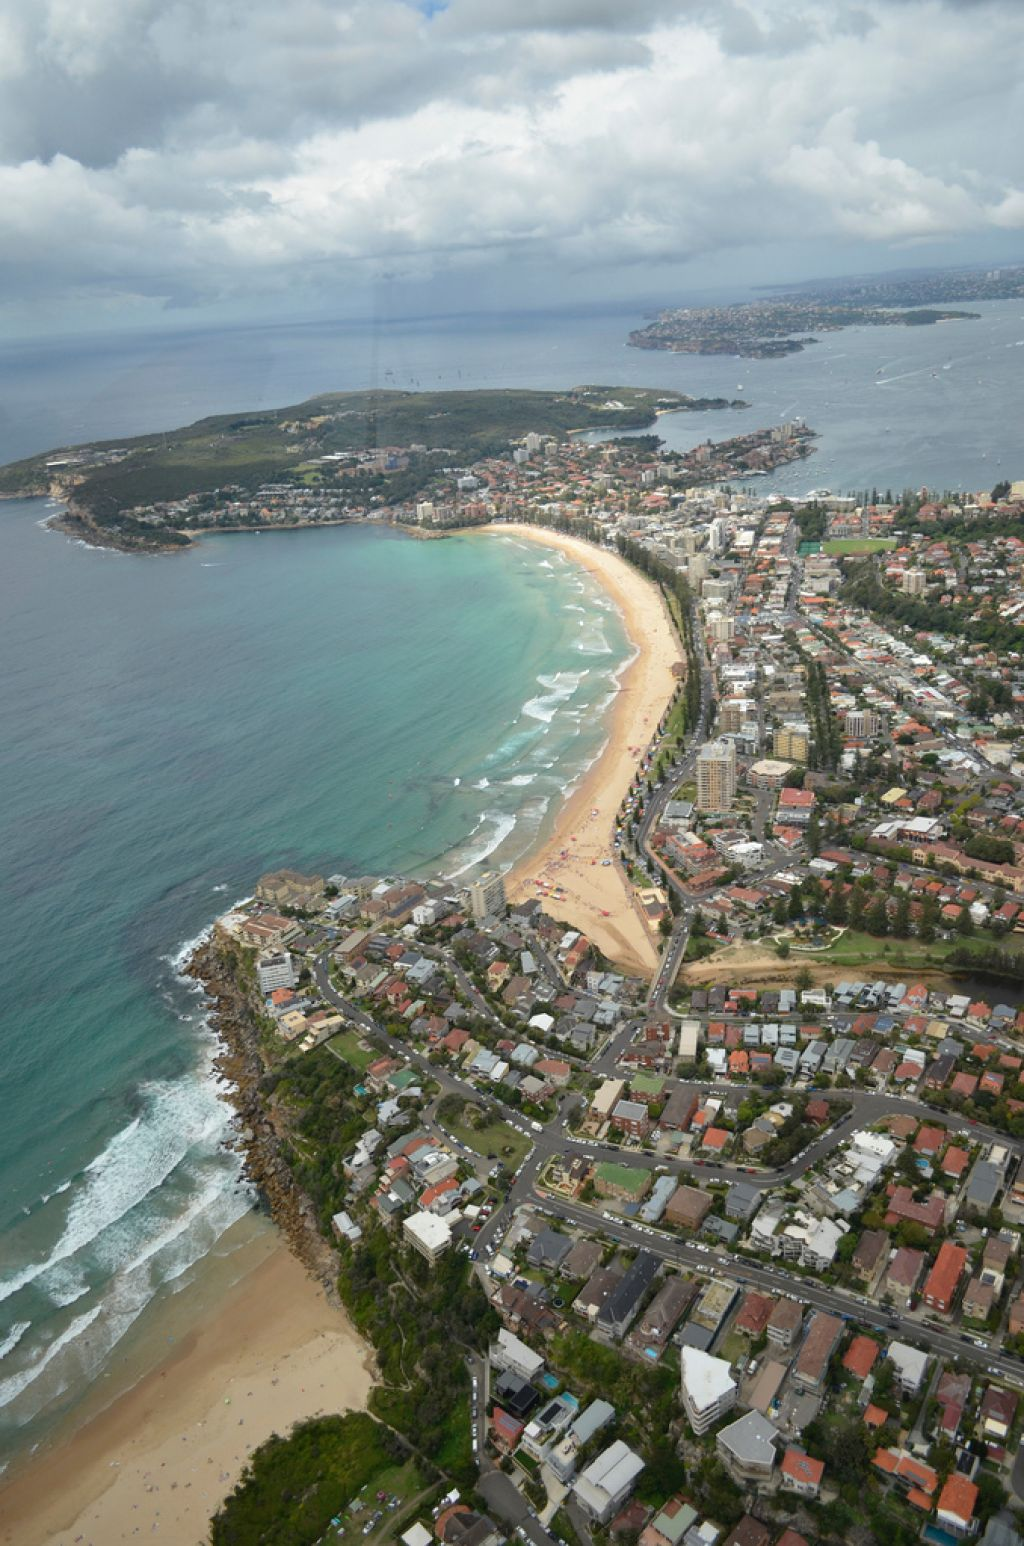 helicopter flight6 Helicopter flight over Sydney